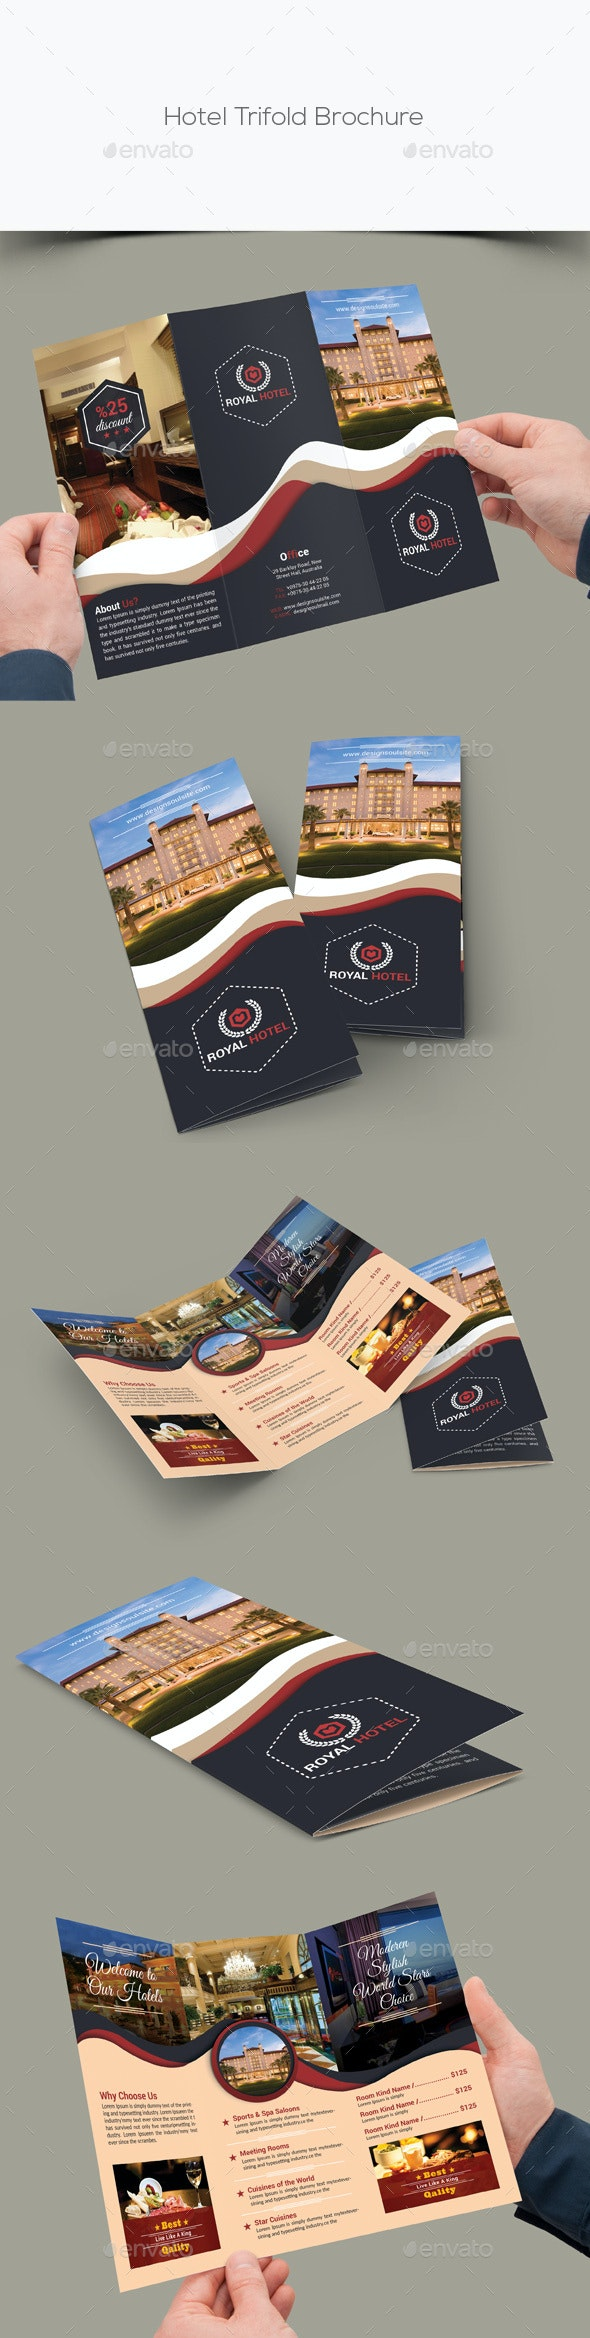 Hotel Trifold Brochure - Corporate Brochures